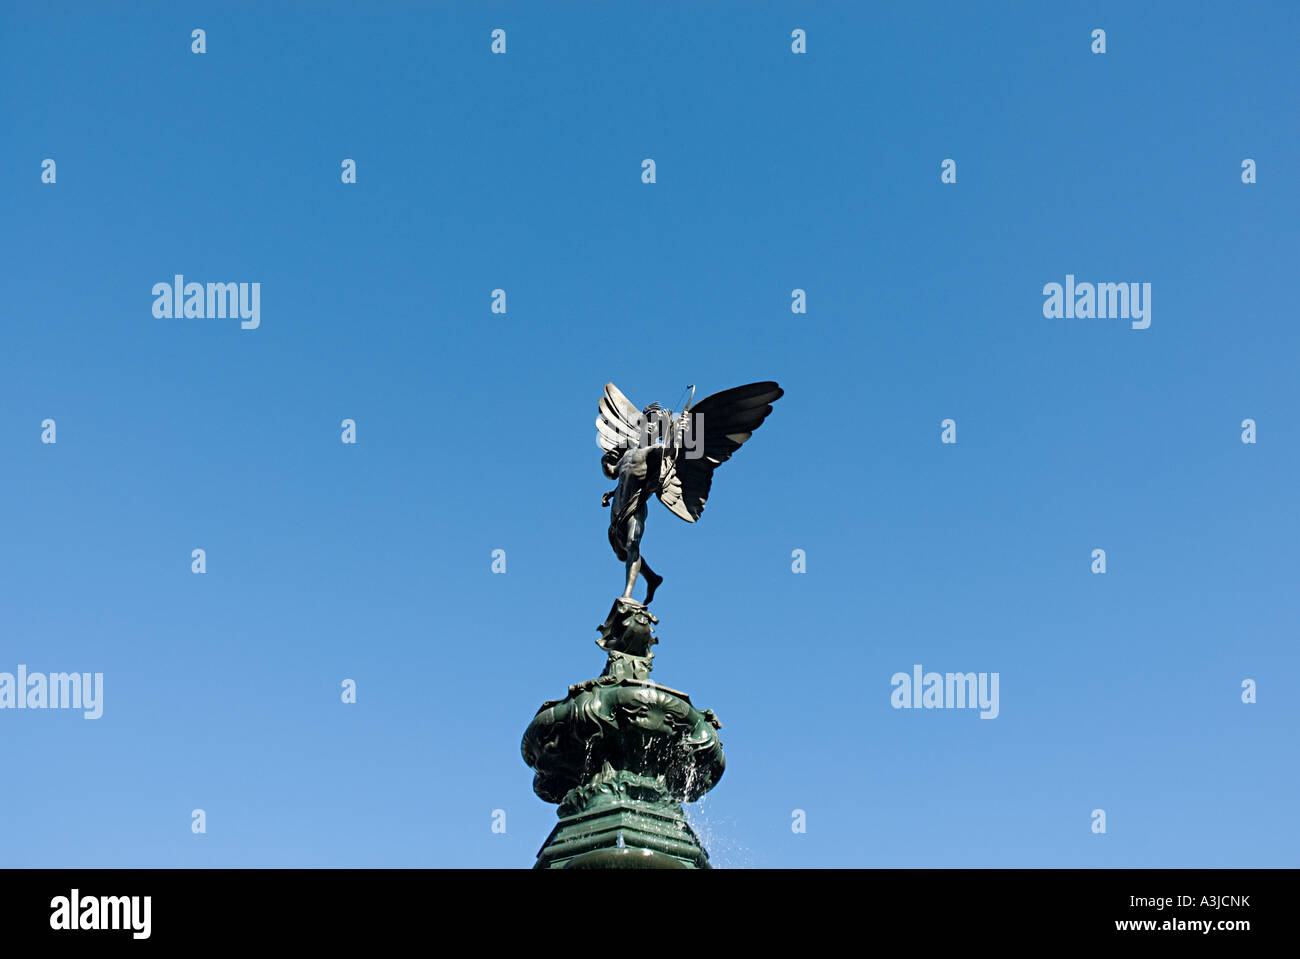 Statue of eros - Stock Image